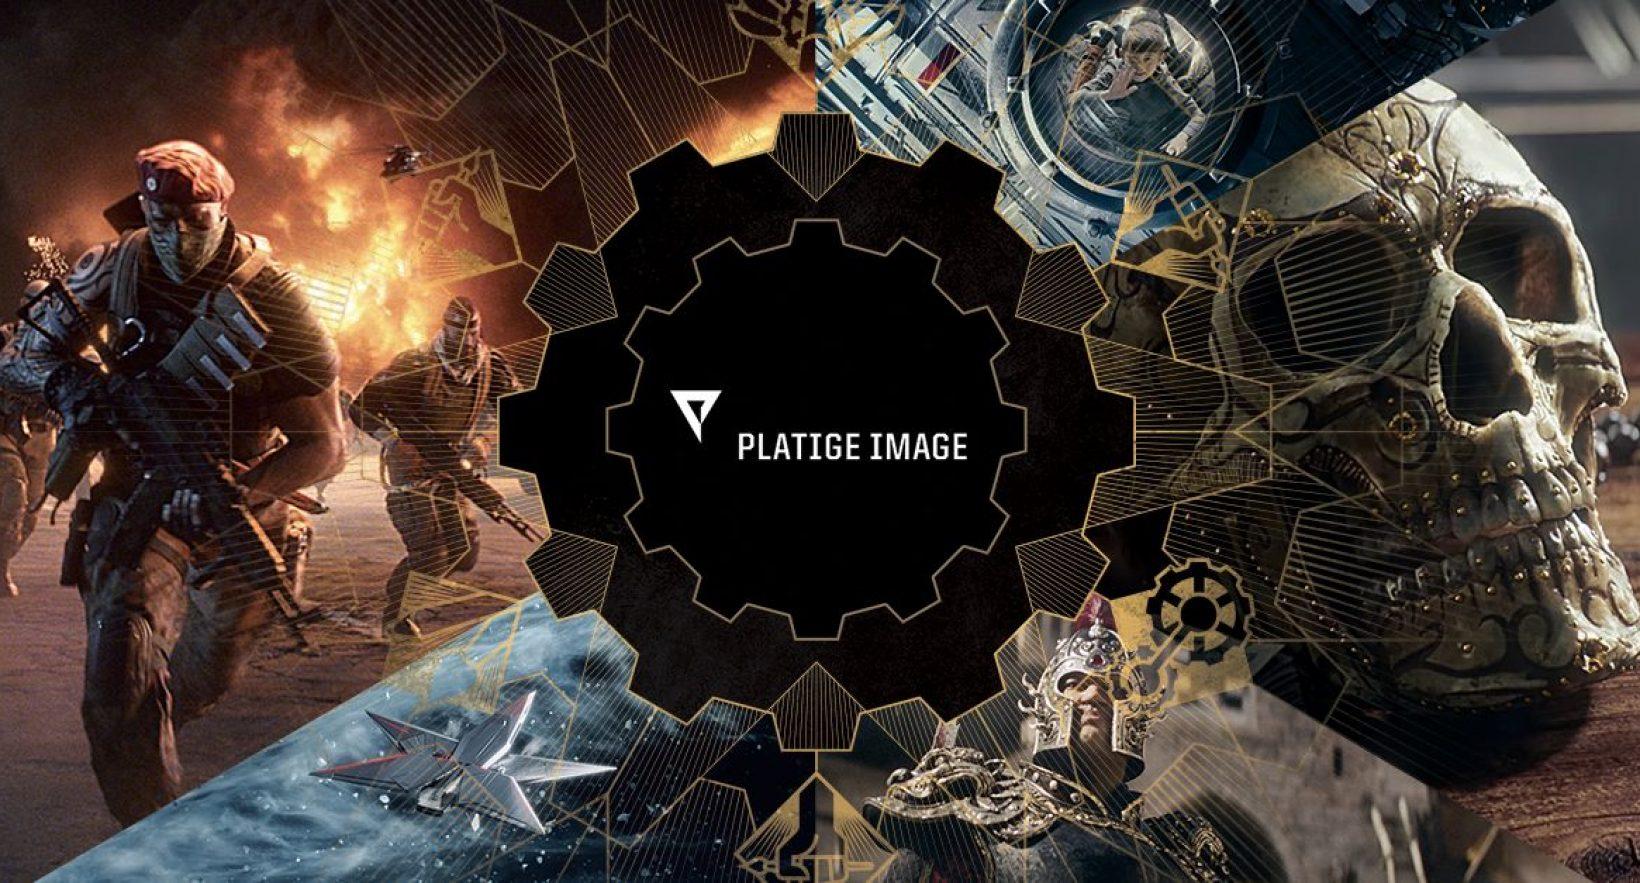 Image Games